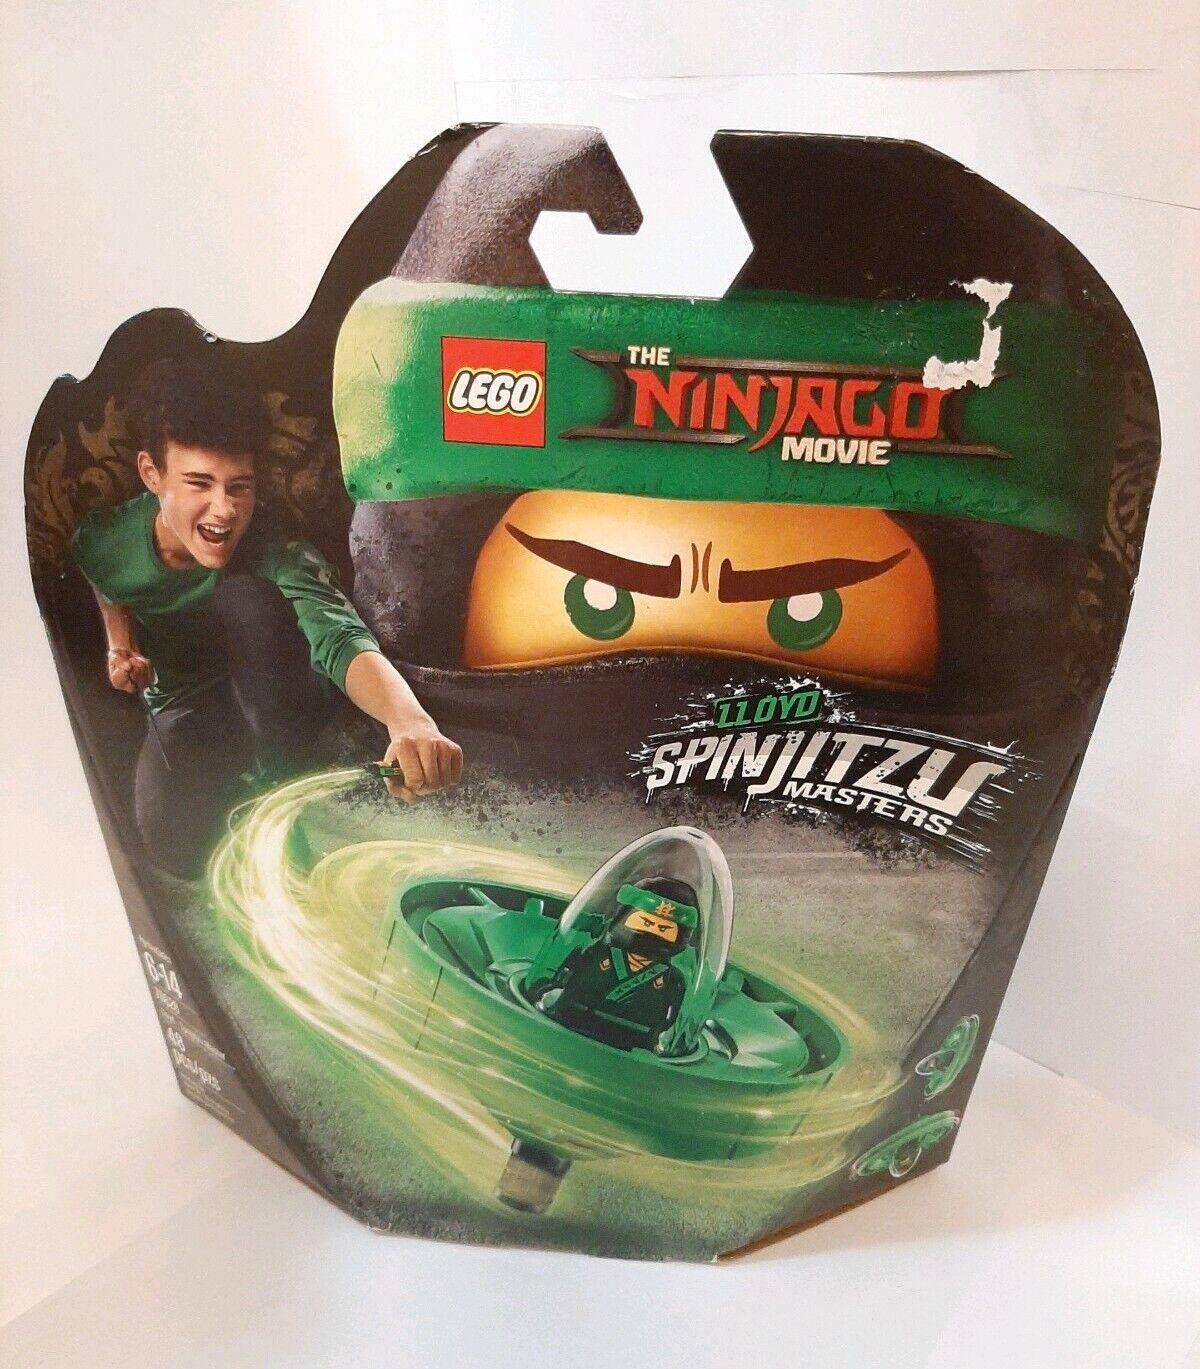 70628 The LEGO Ninjago Movie Lloyd New 2018! Spinjitzu Master 48 Pieces Age 6